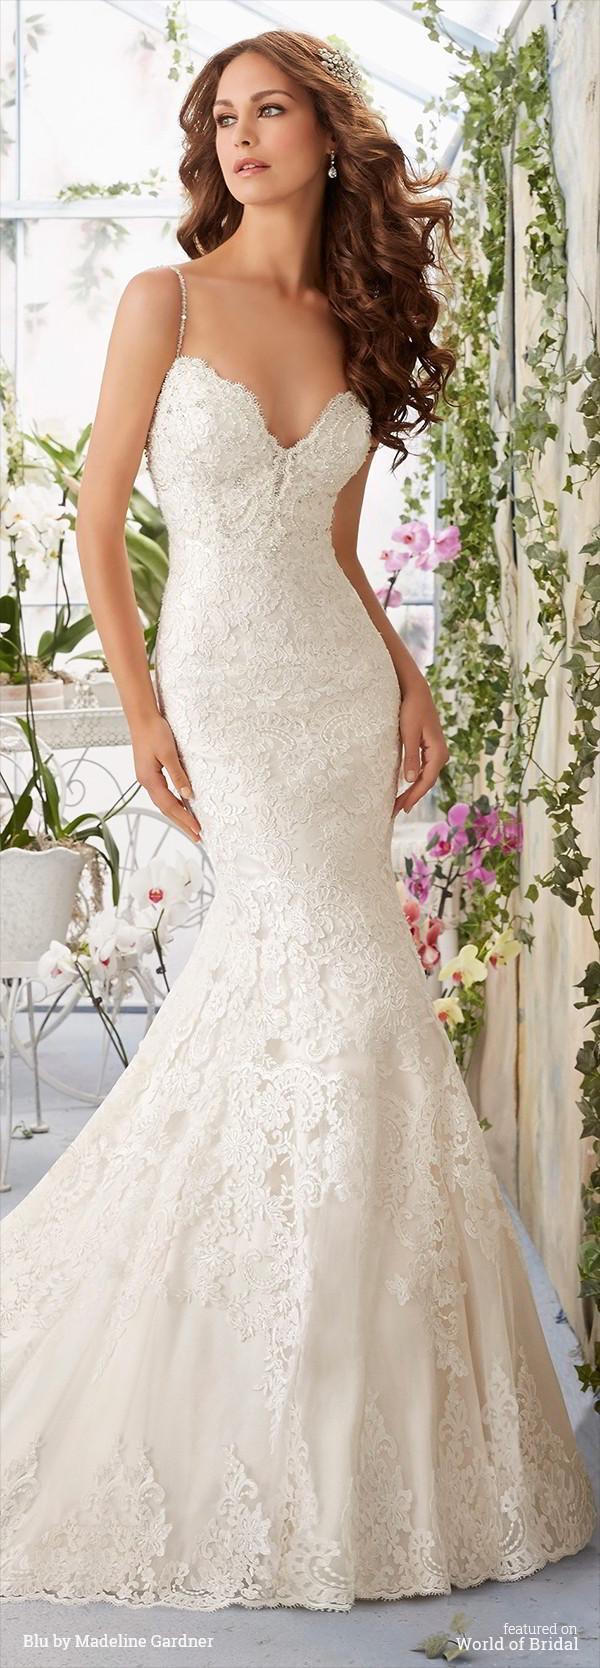 Mariage - Blu by Madeline Gardner Spring 2016 Wedding Dresses